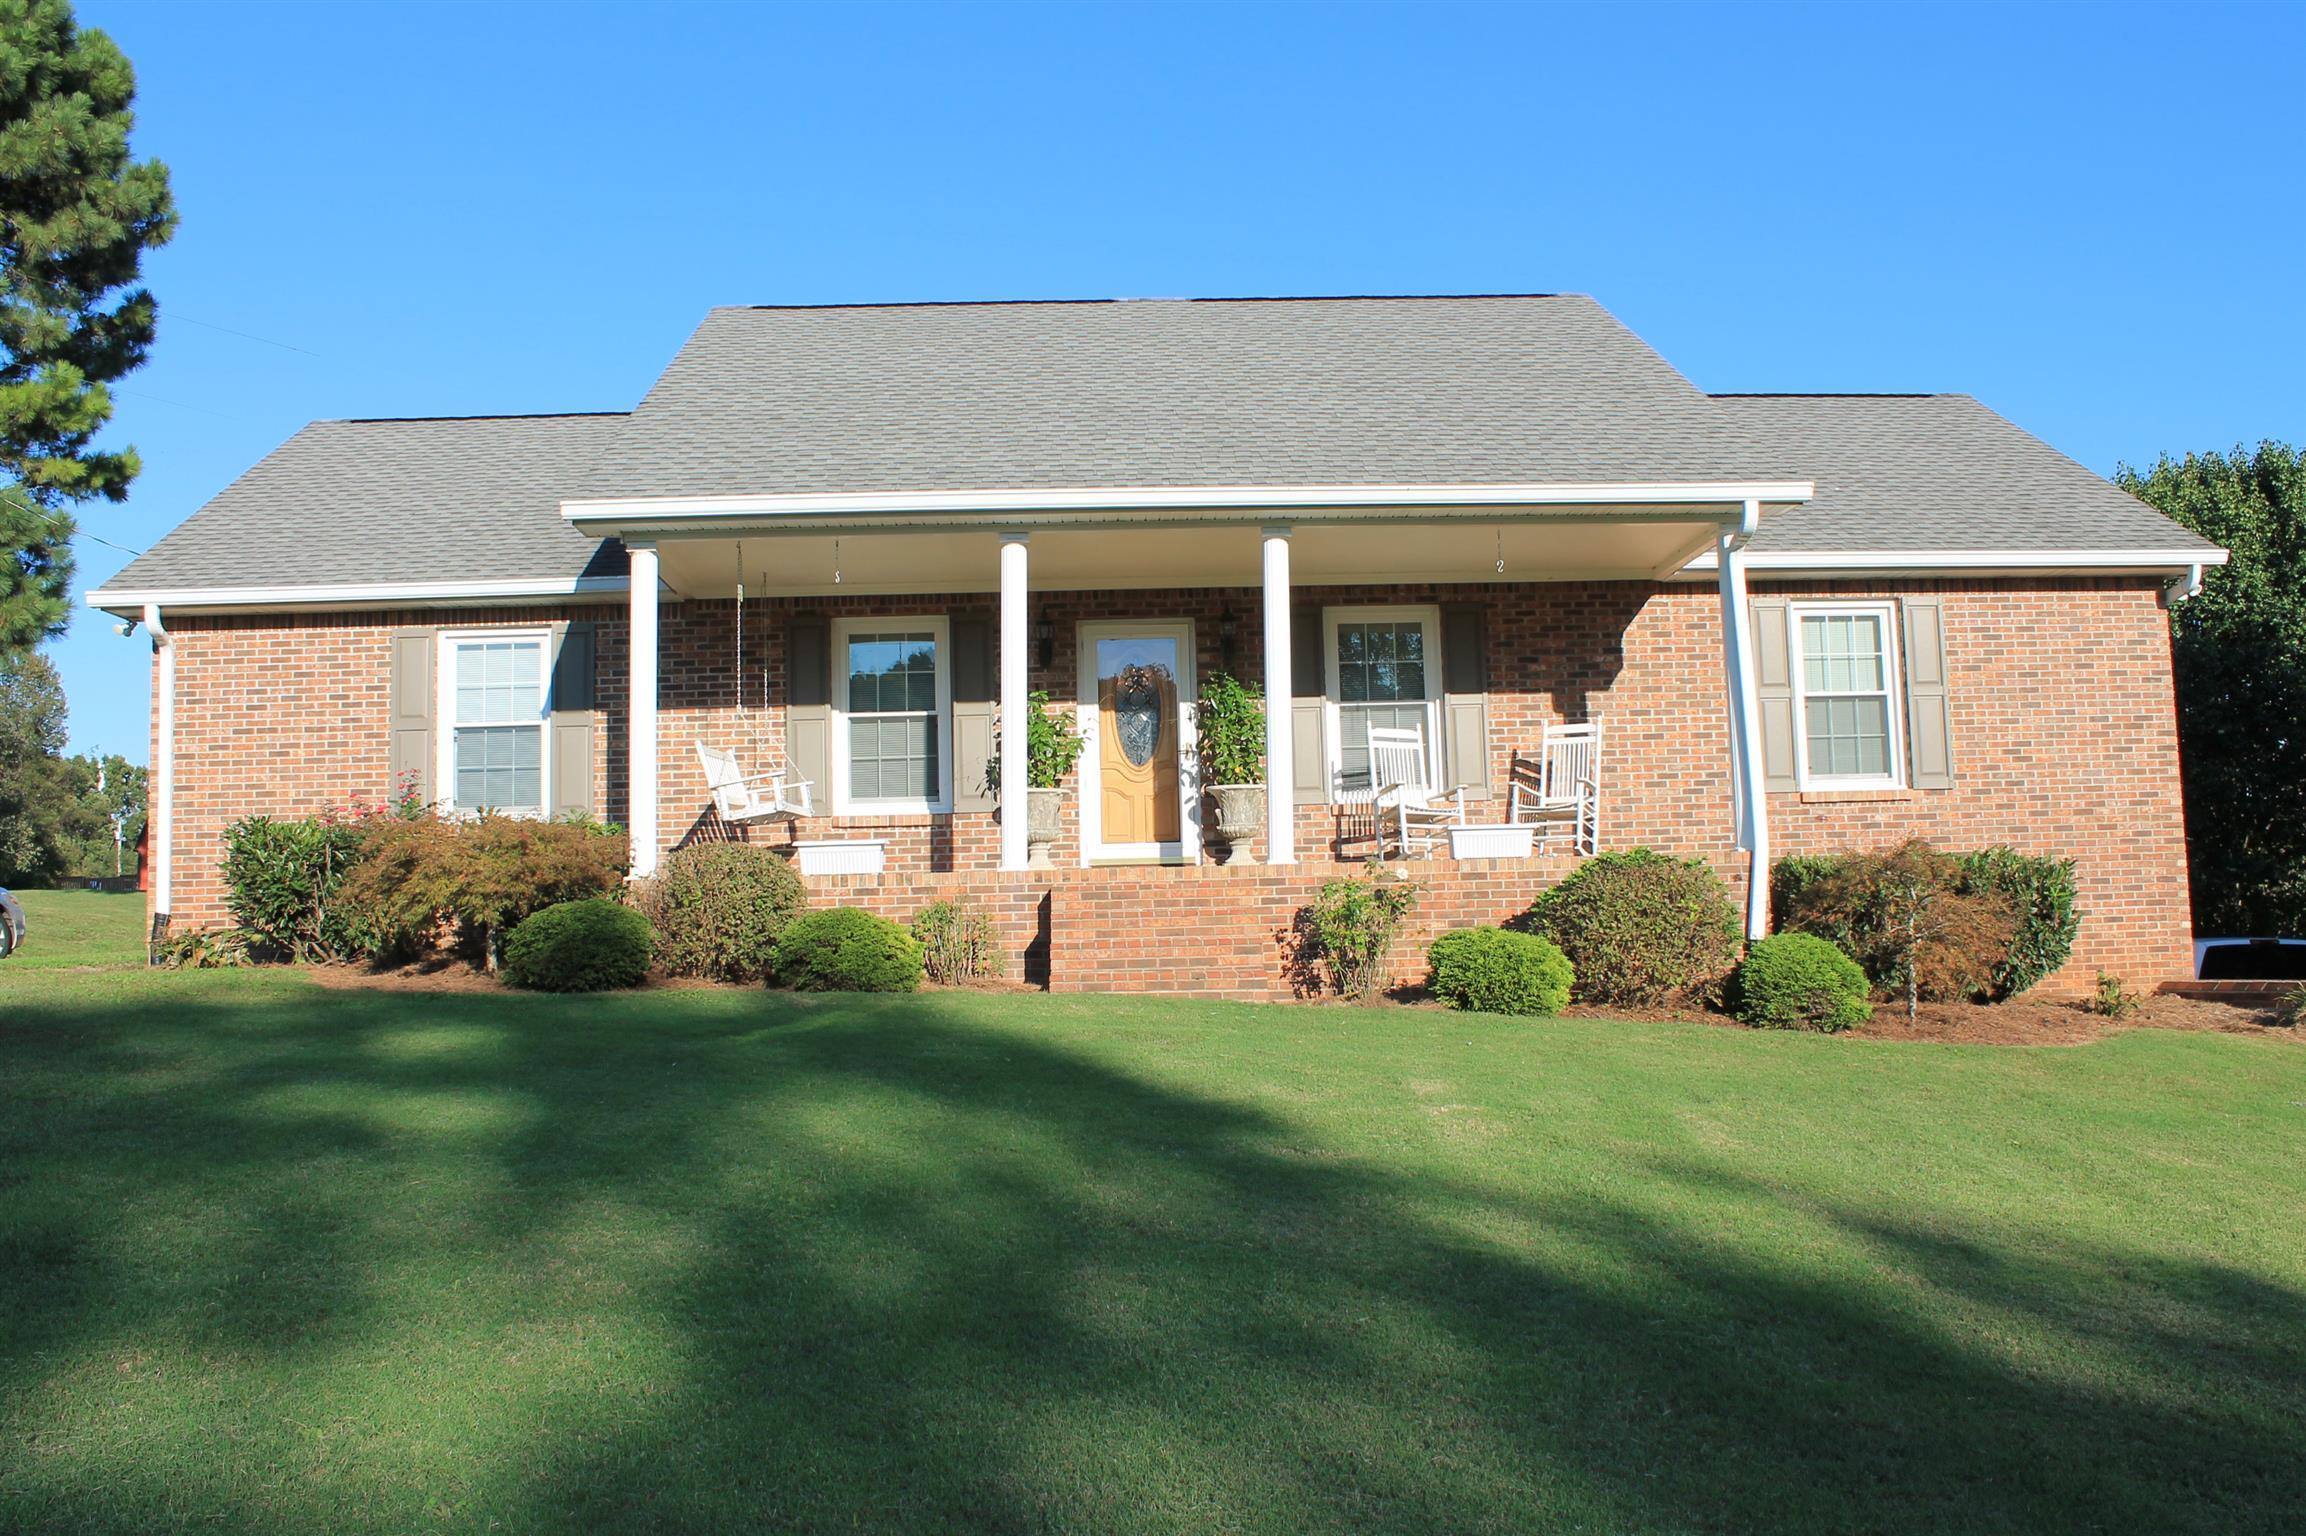 7852 Mill Rd, Cross Plains, TN 37049 - Cross Plains, TN real estate listing